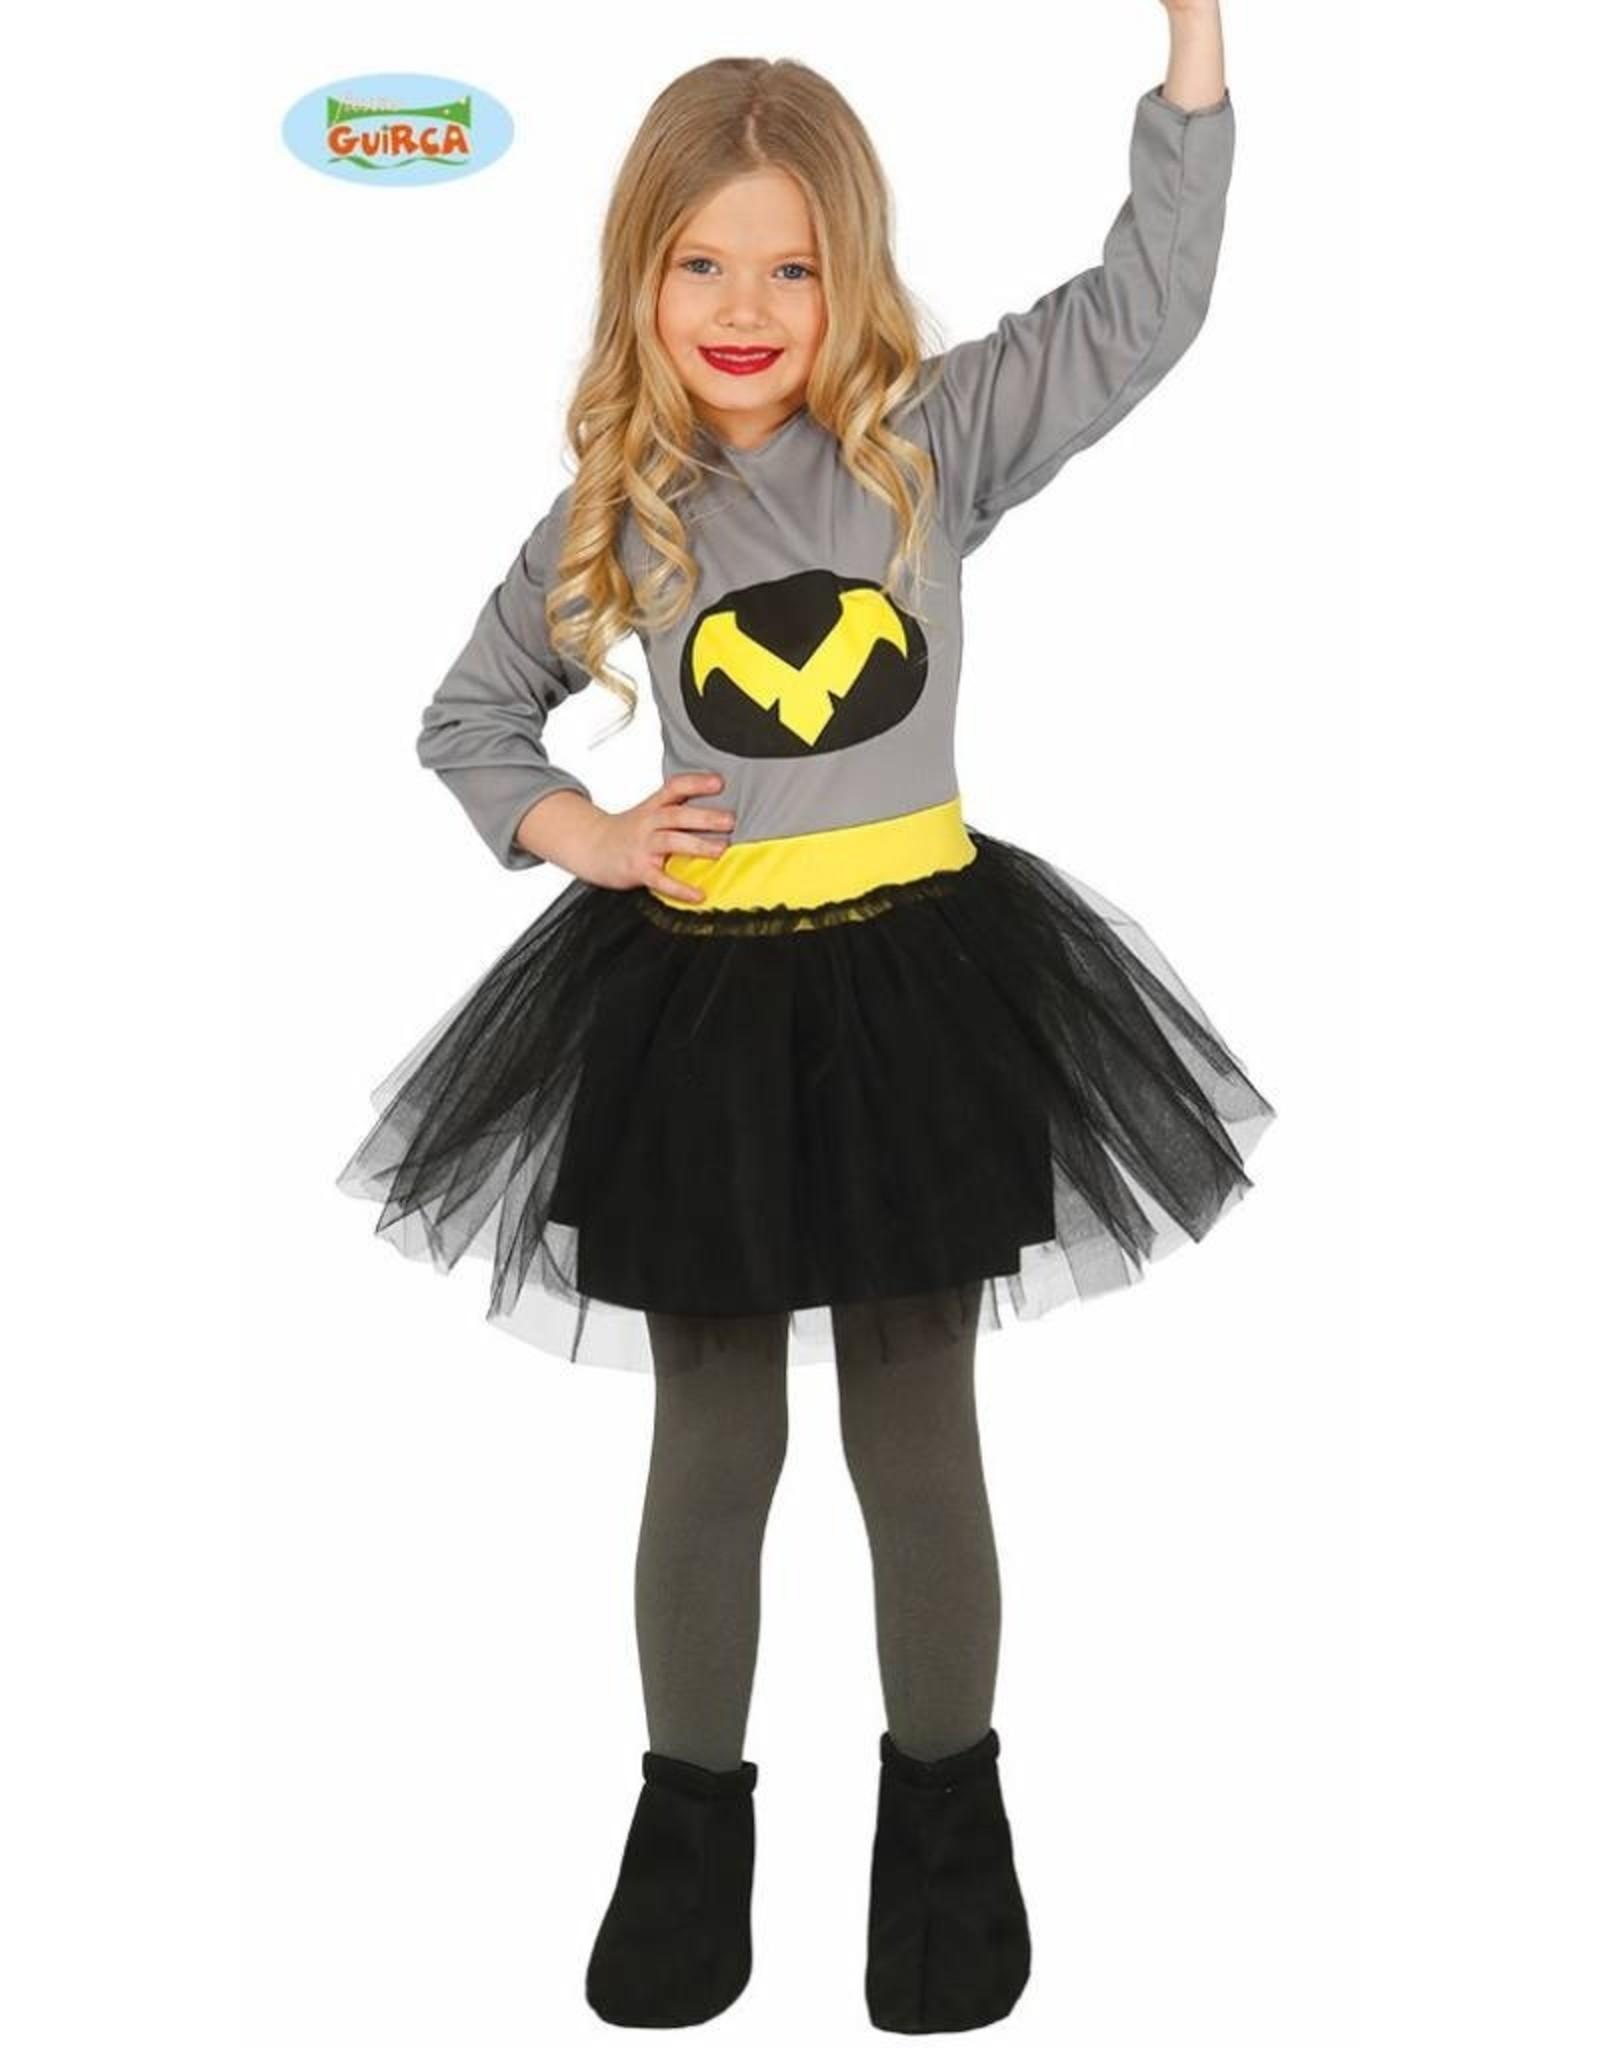 FIESTAS GUIRCA batgirl 5 tot 6 jaar